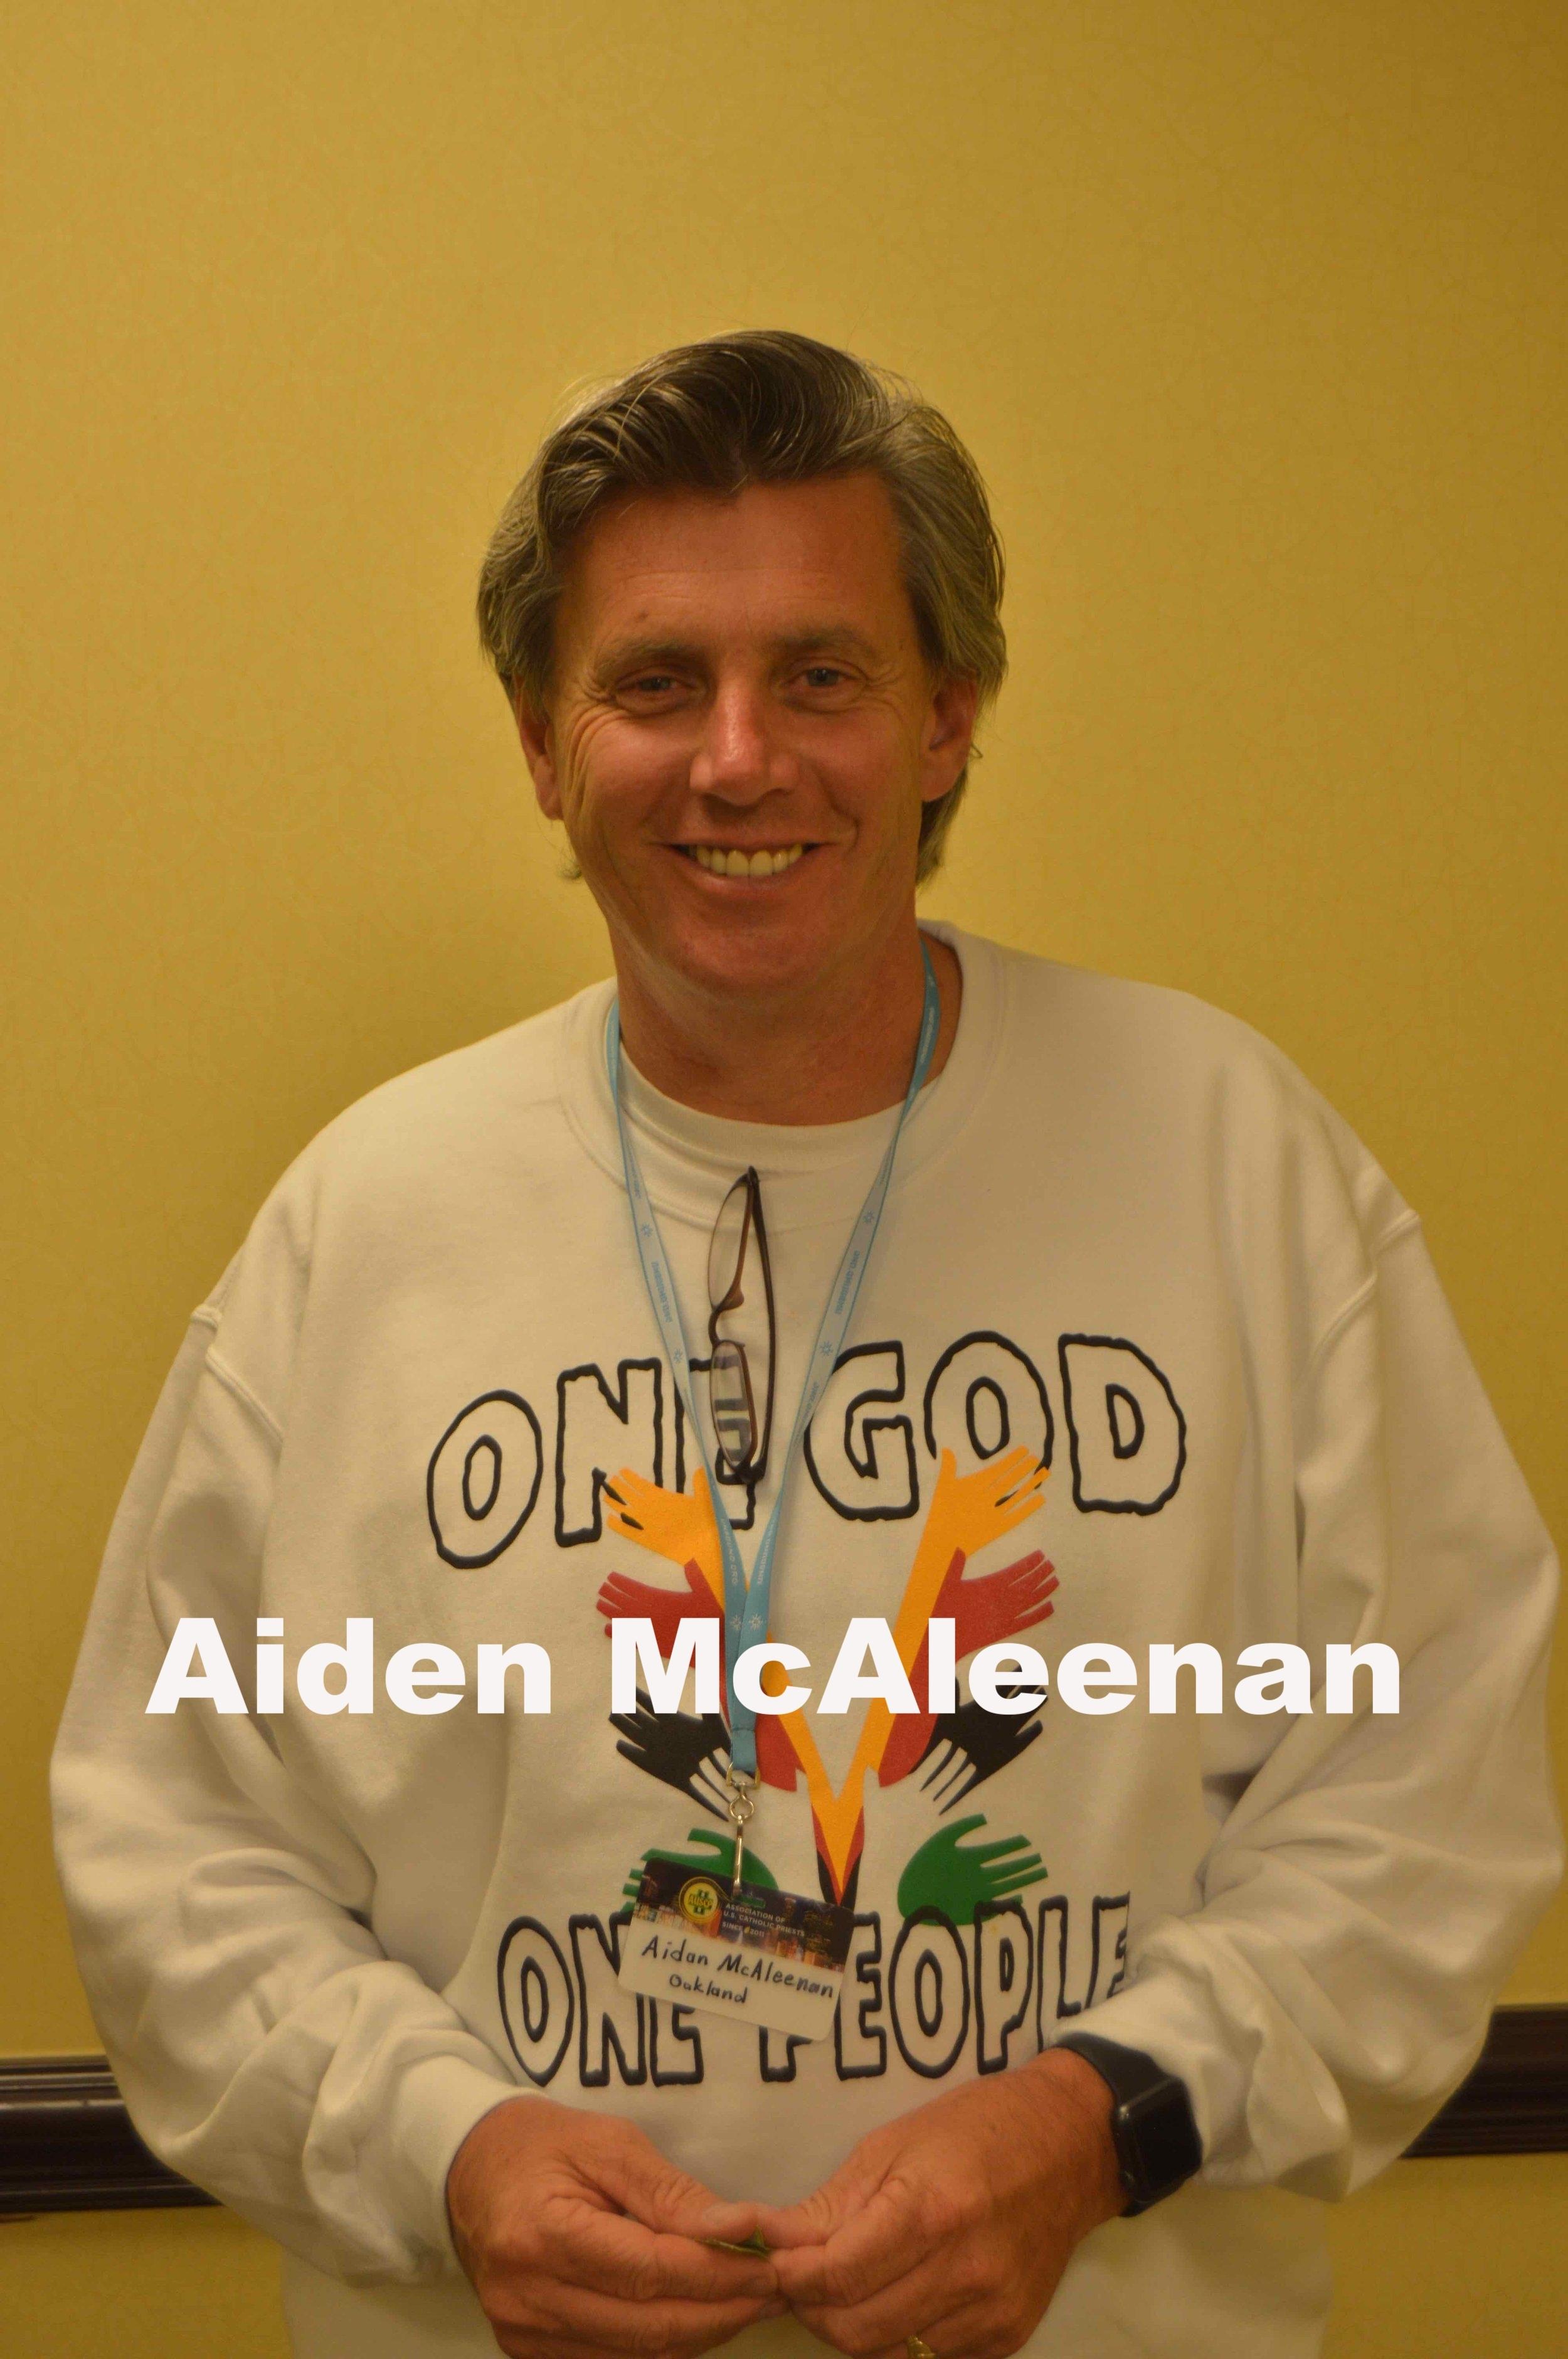 AidenMcAleenan.jpg